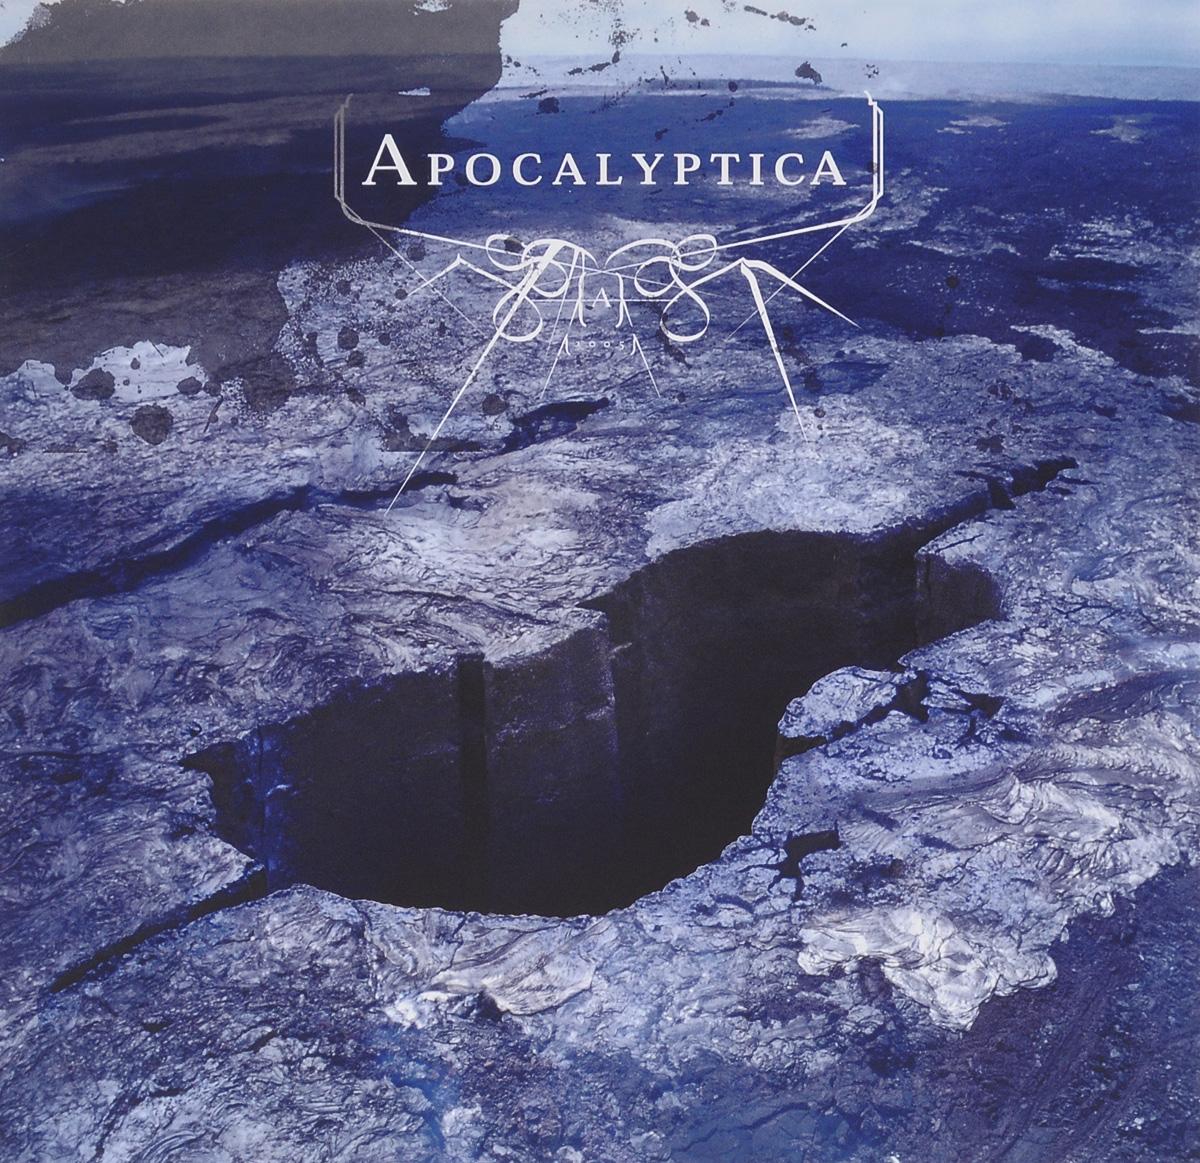 Apocalyptica Apocalyptica. Apocalyptica (2 LP + CD) apocalyptica apocalyptica shadowmaker 2 lp cd